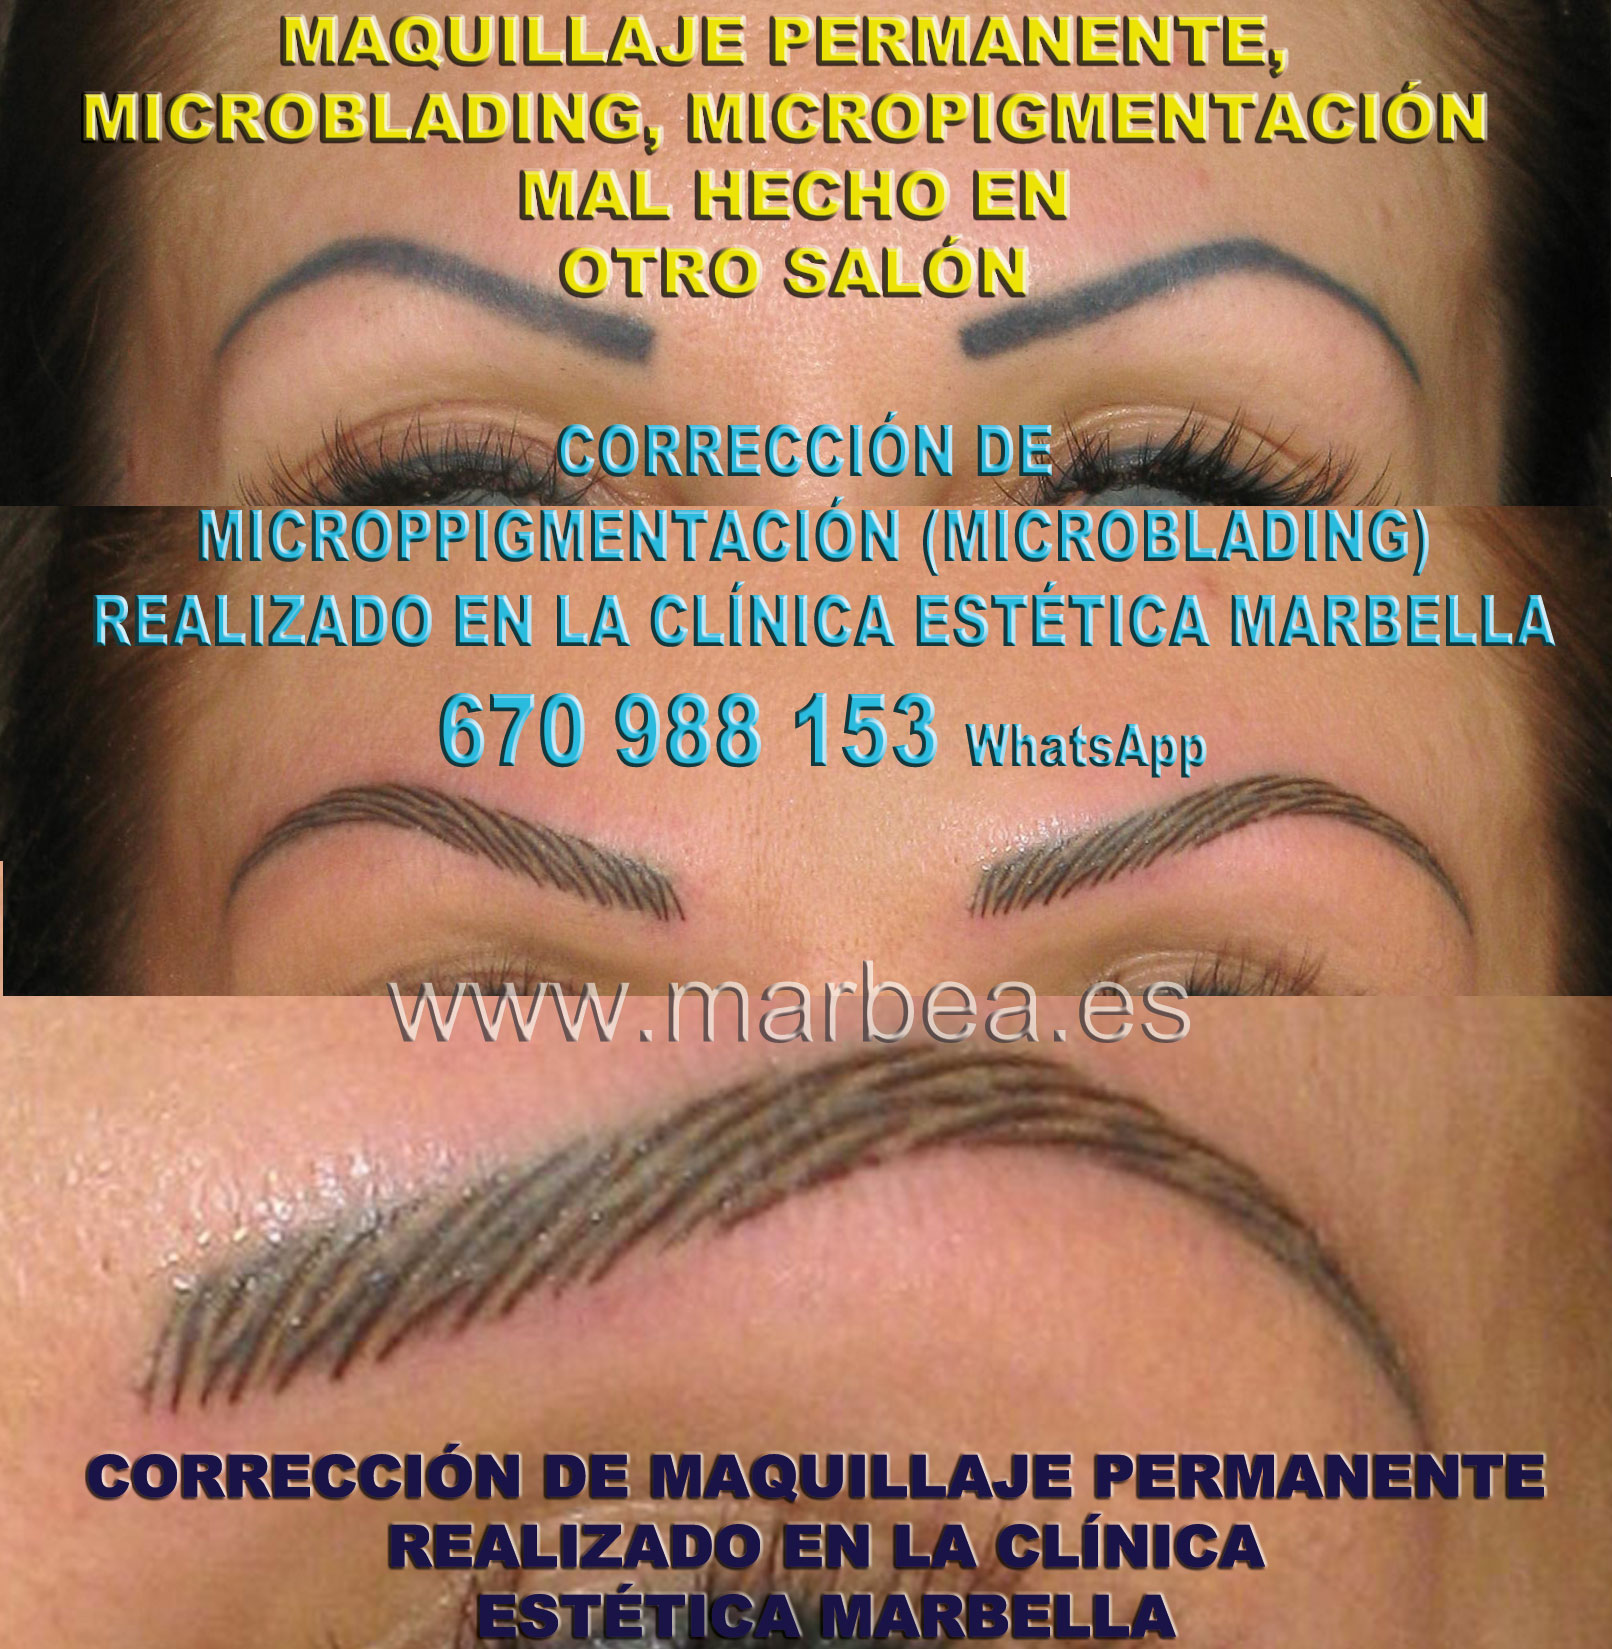 ELIMINAR TATUAJE CEJAS clínica estética micropigmentación ofrece micropigmentacion correctiva de cejas,corregir micropigmentación no deseada